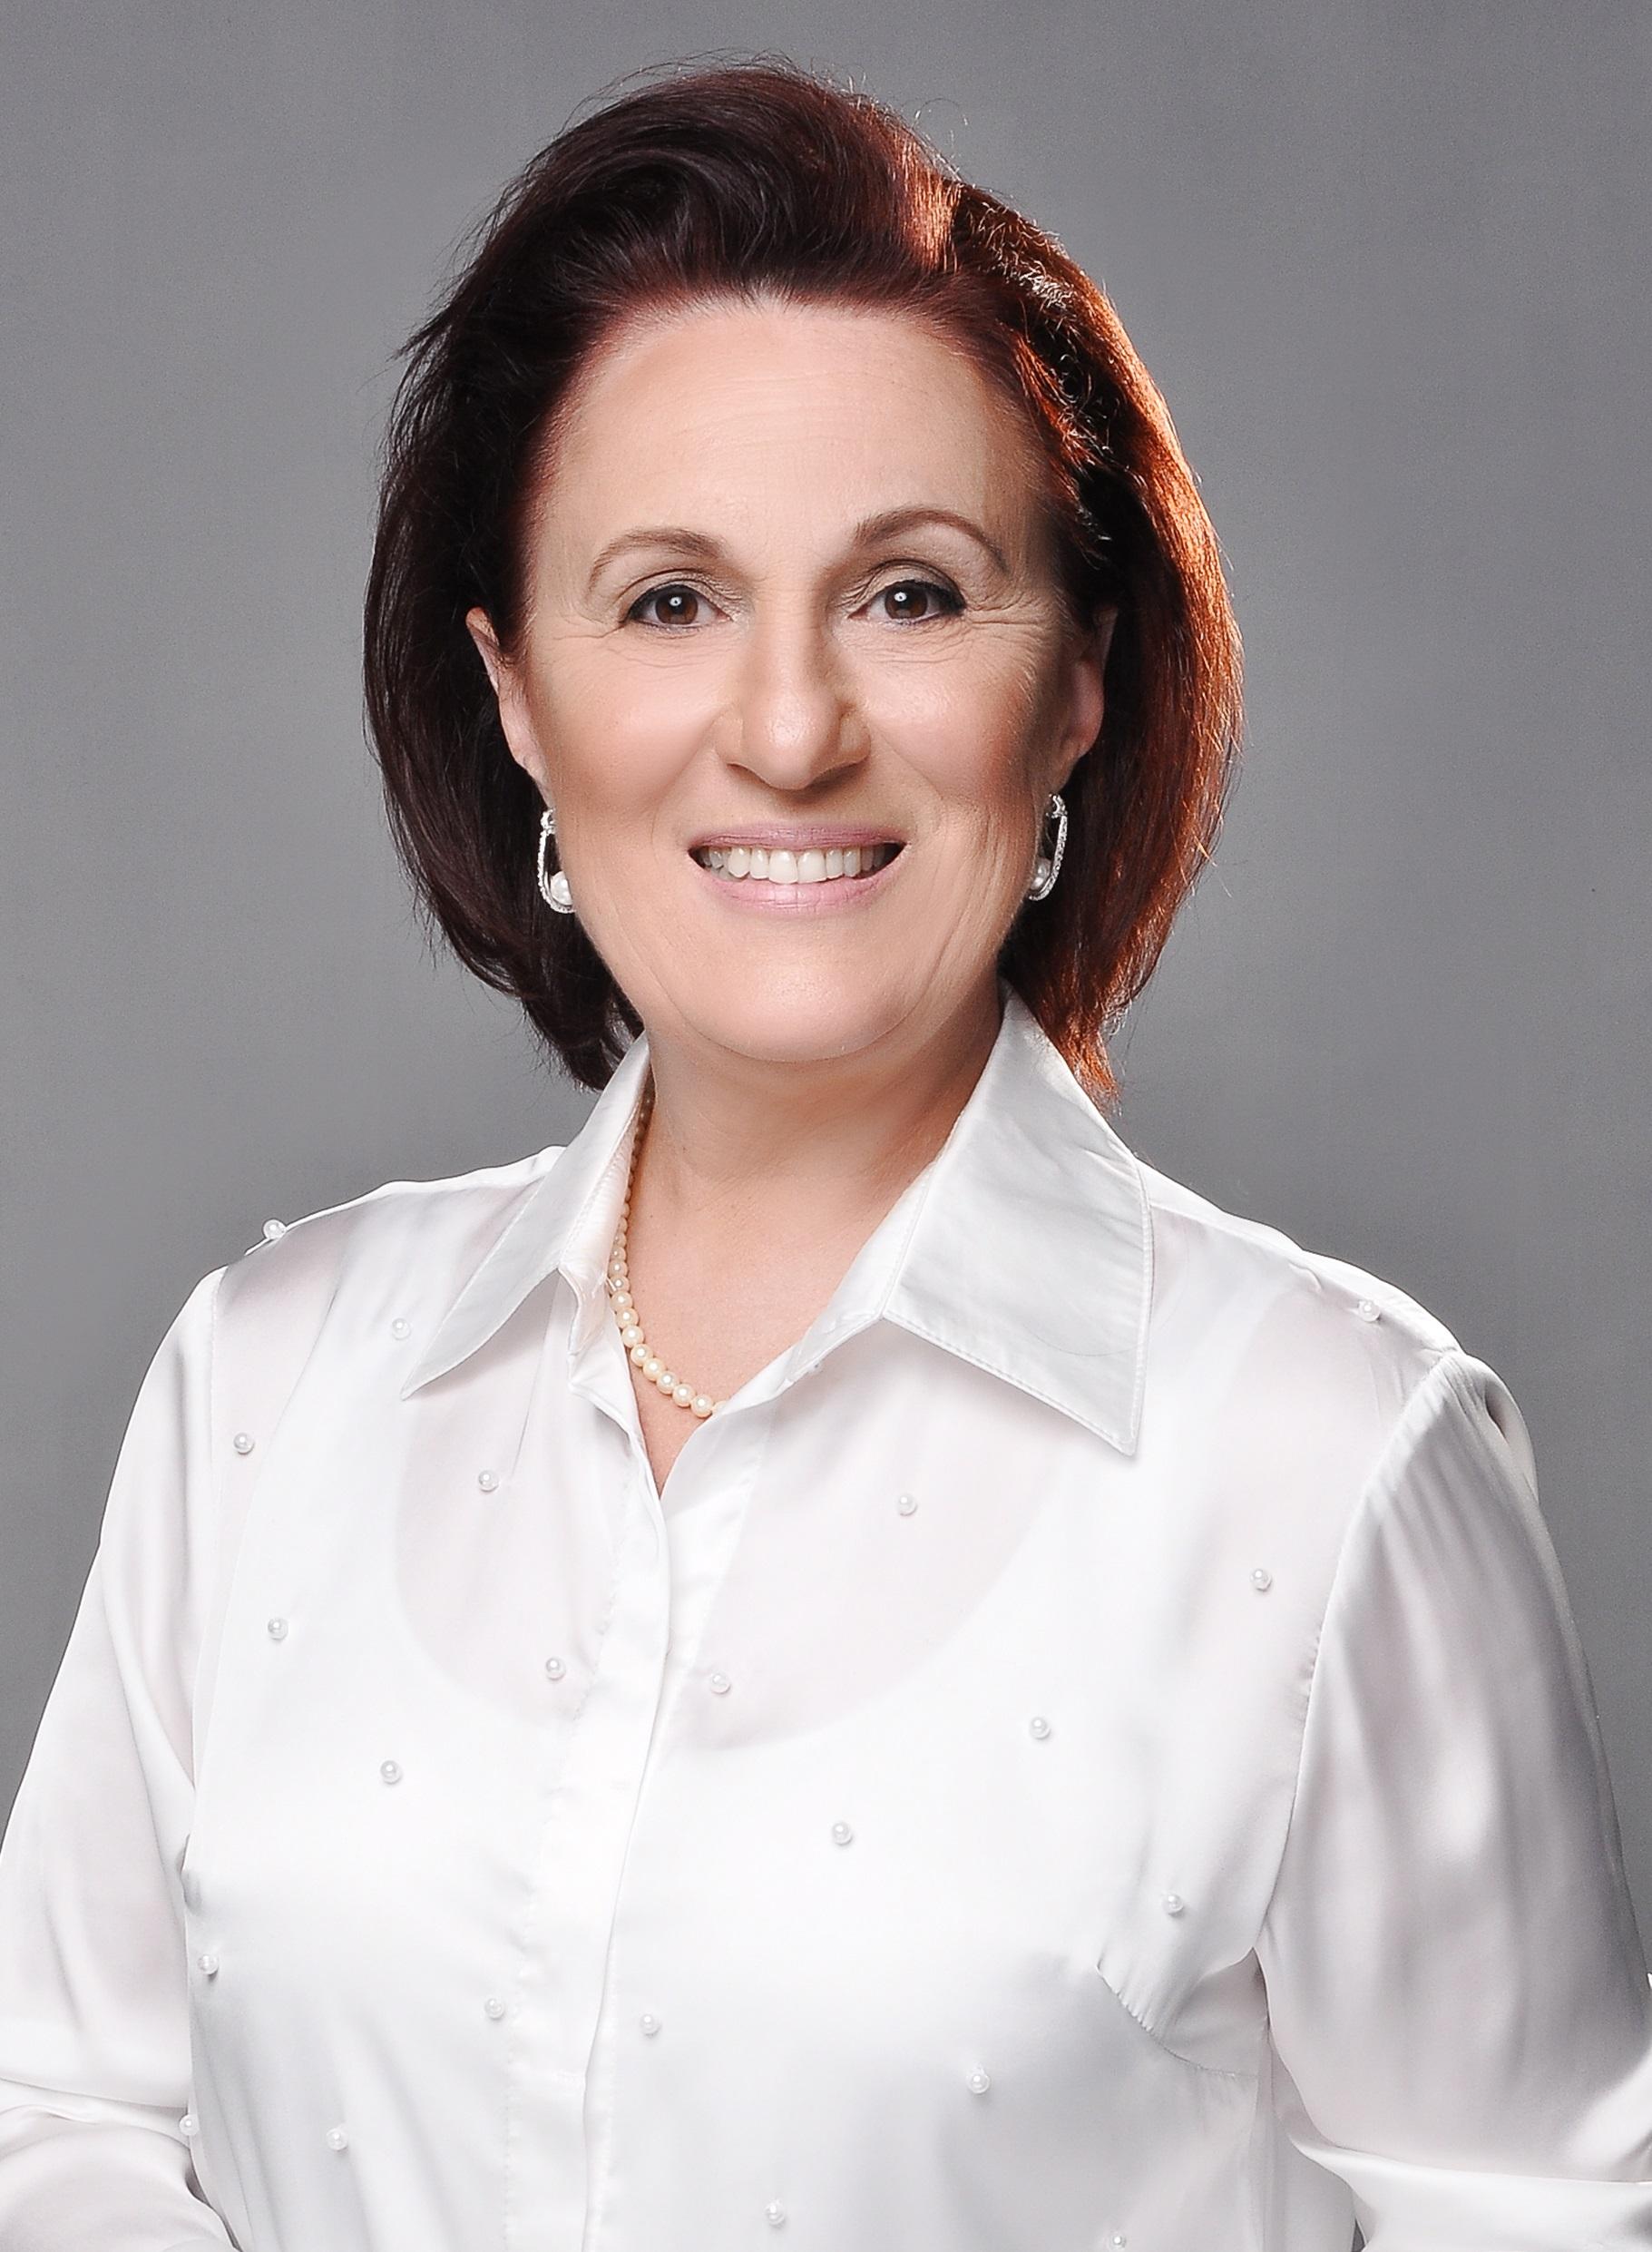 Thelma Maria Cosmoski Campagnoli